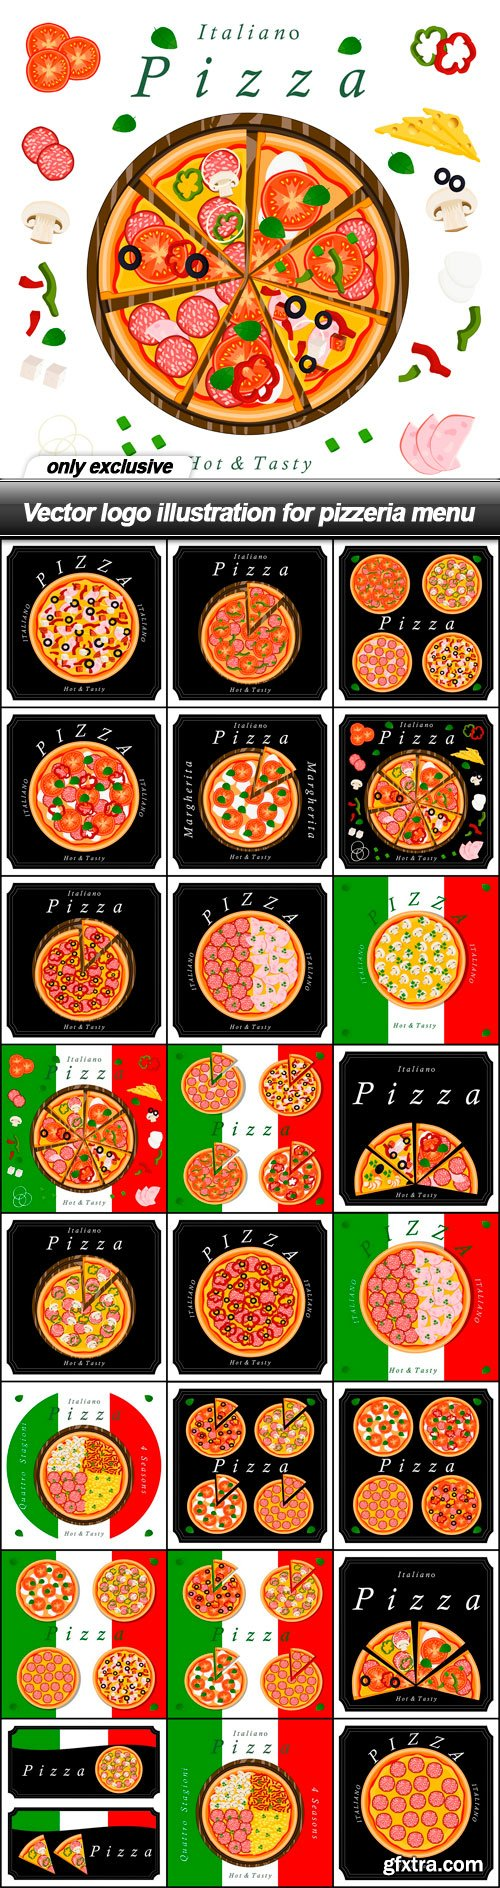 Vector logo illustration for pizzeria menu - 25 EPS